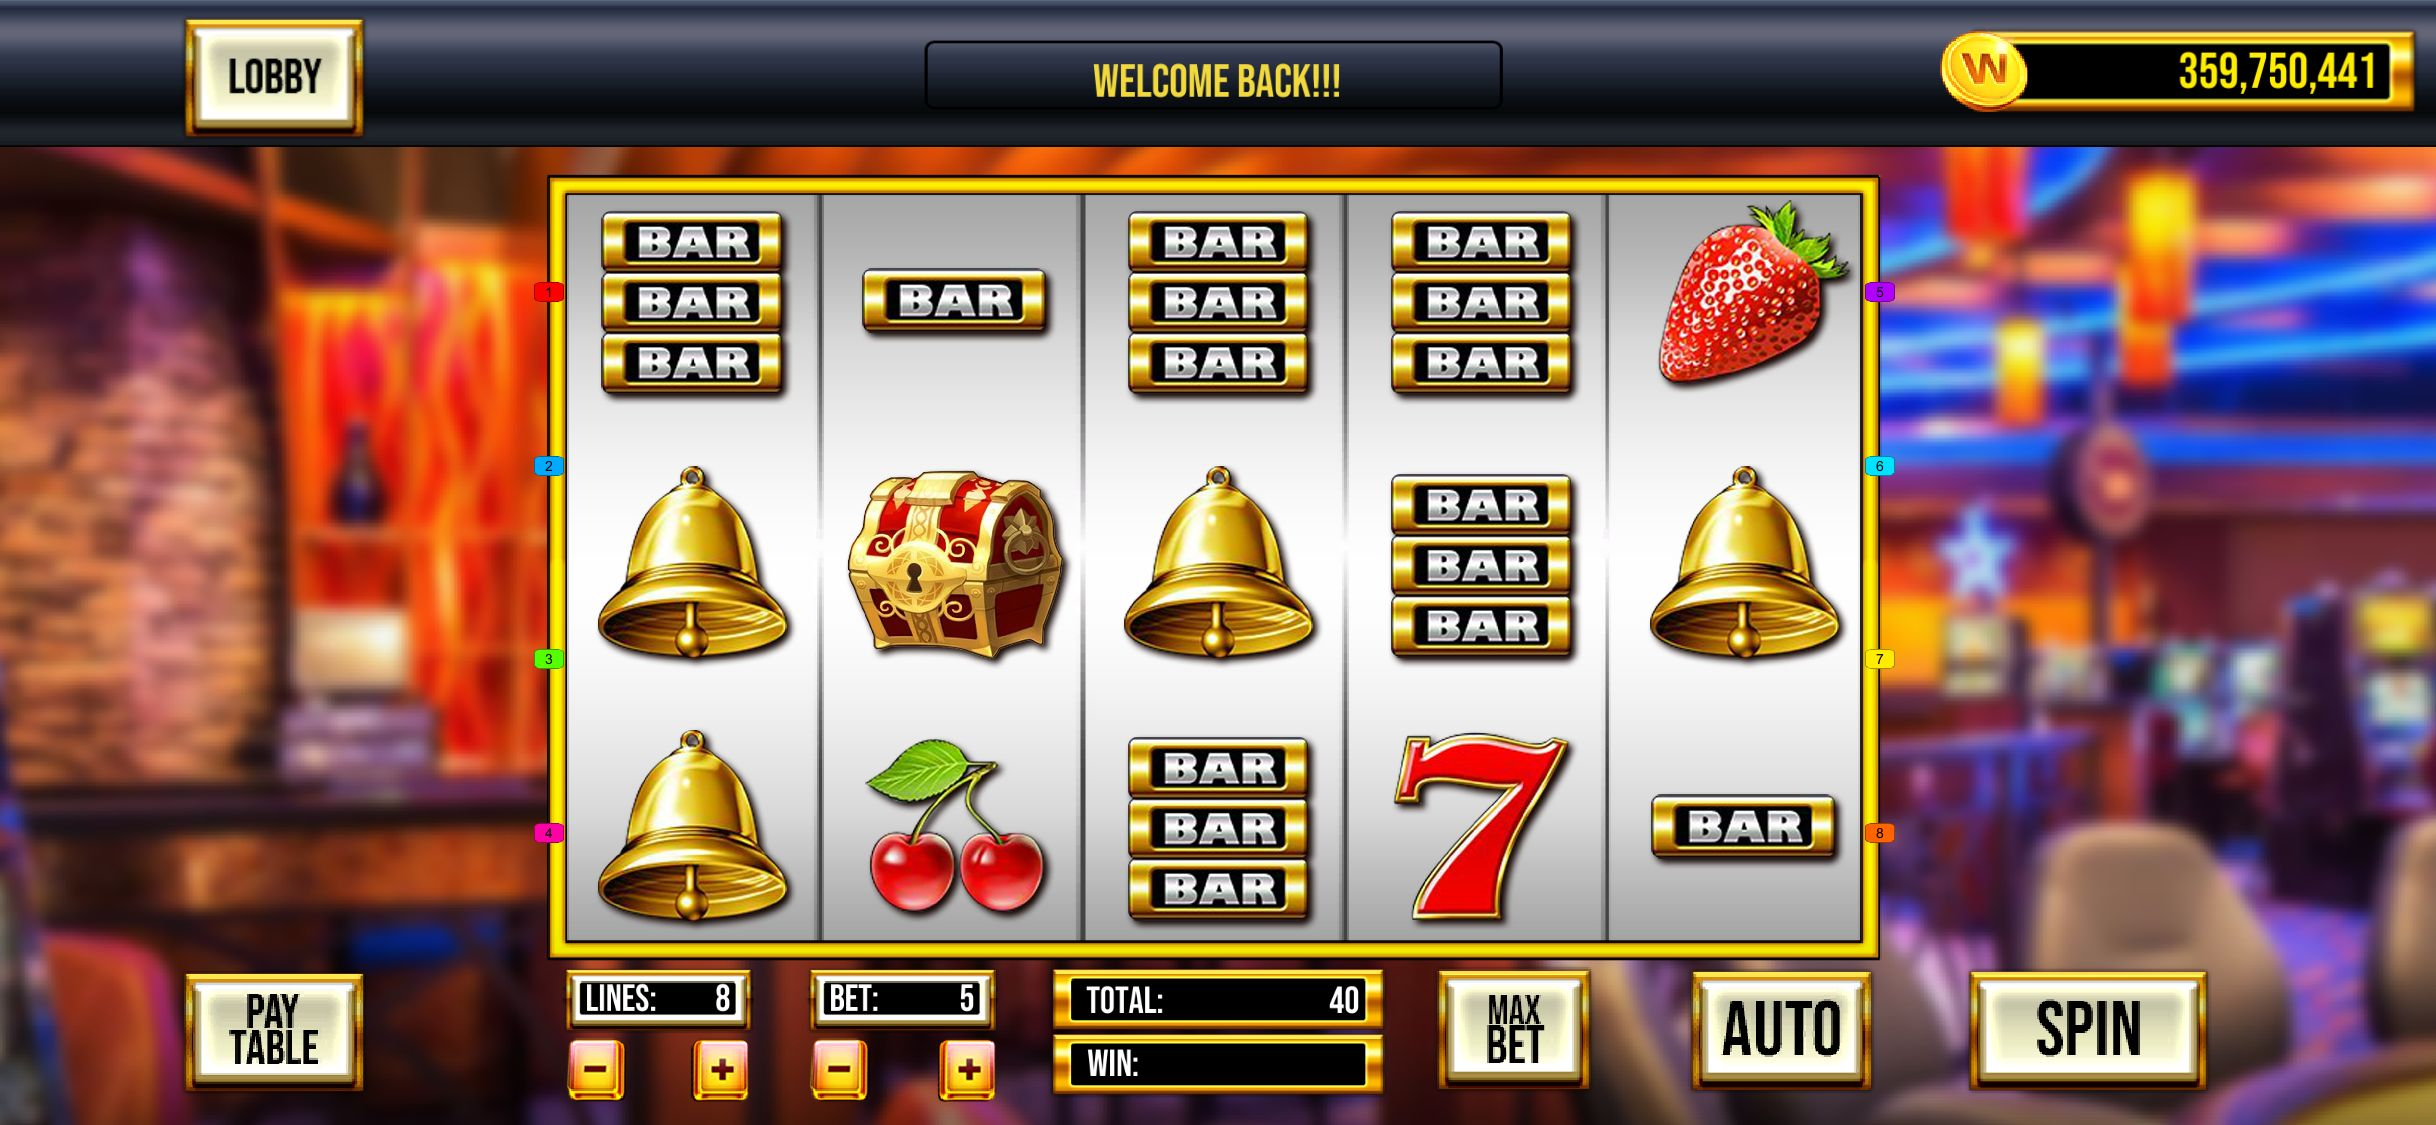 Game Slot Machine Website